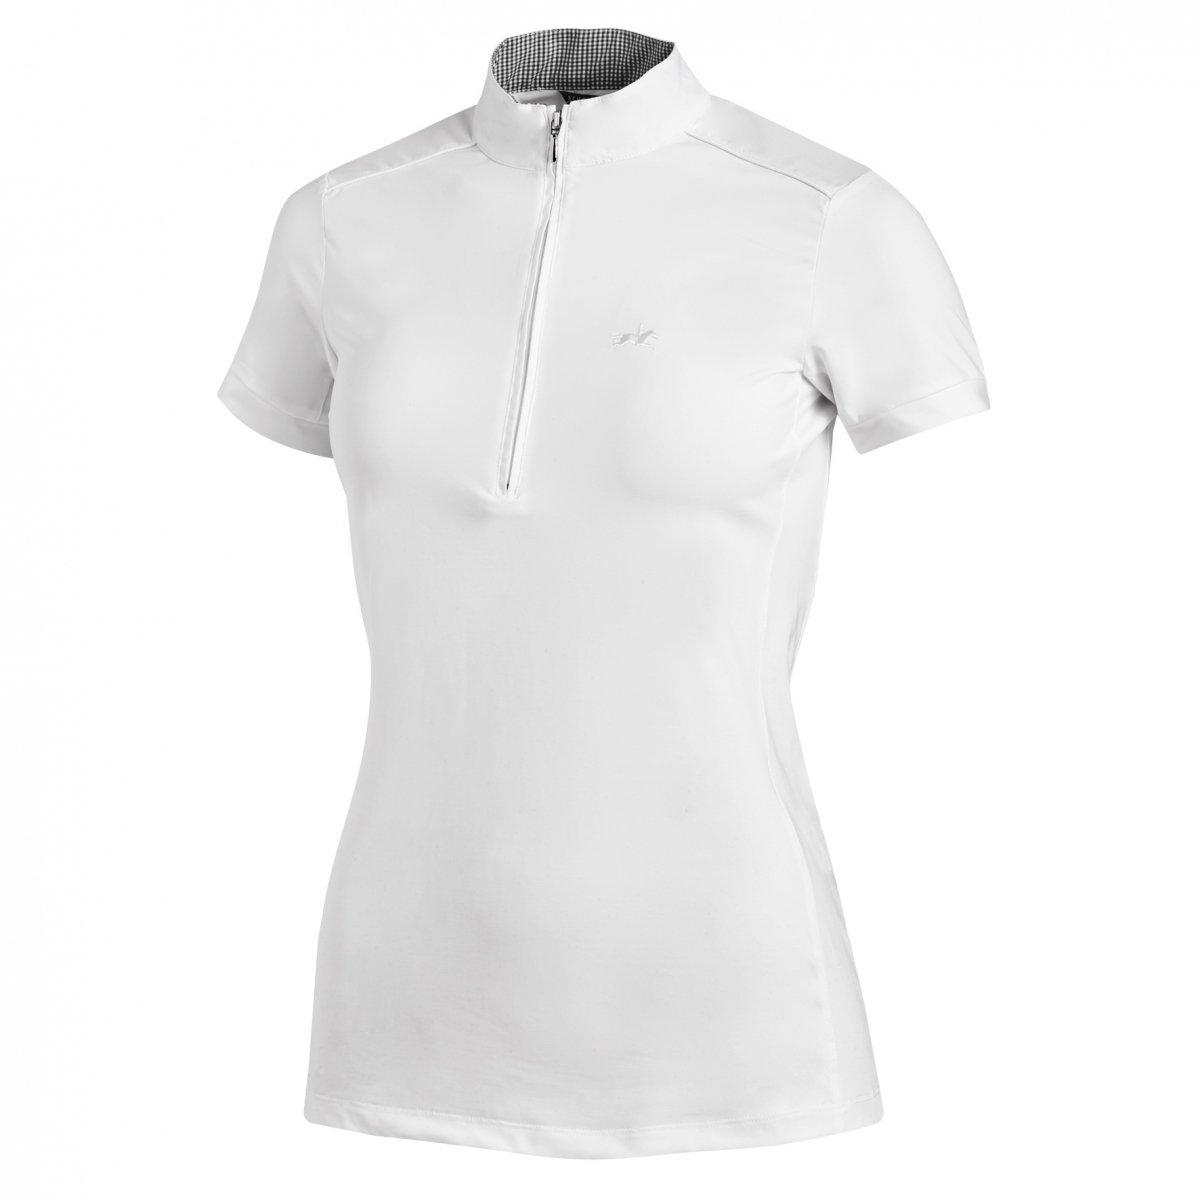 Koszulka konkursowa MELODY kolekcja wiosna-lato 2018 - Schockemohle